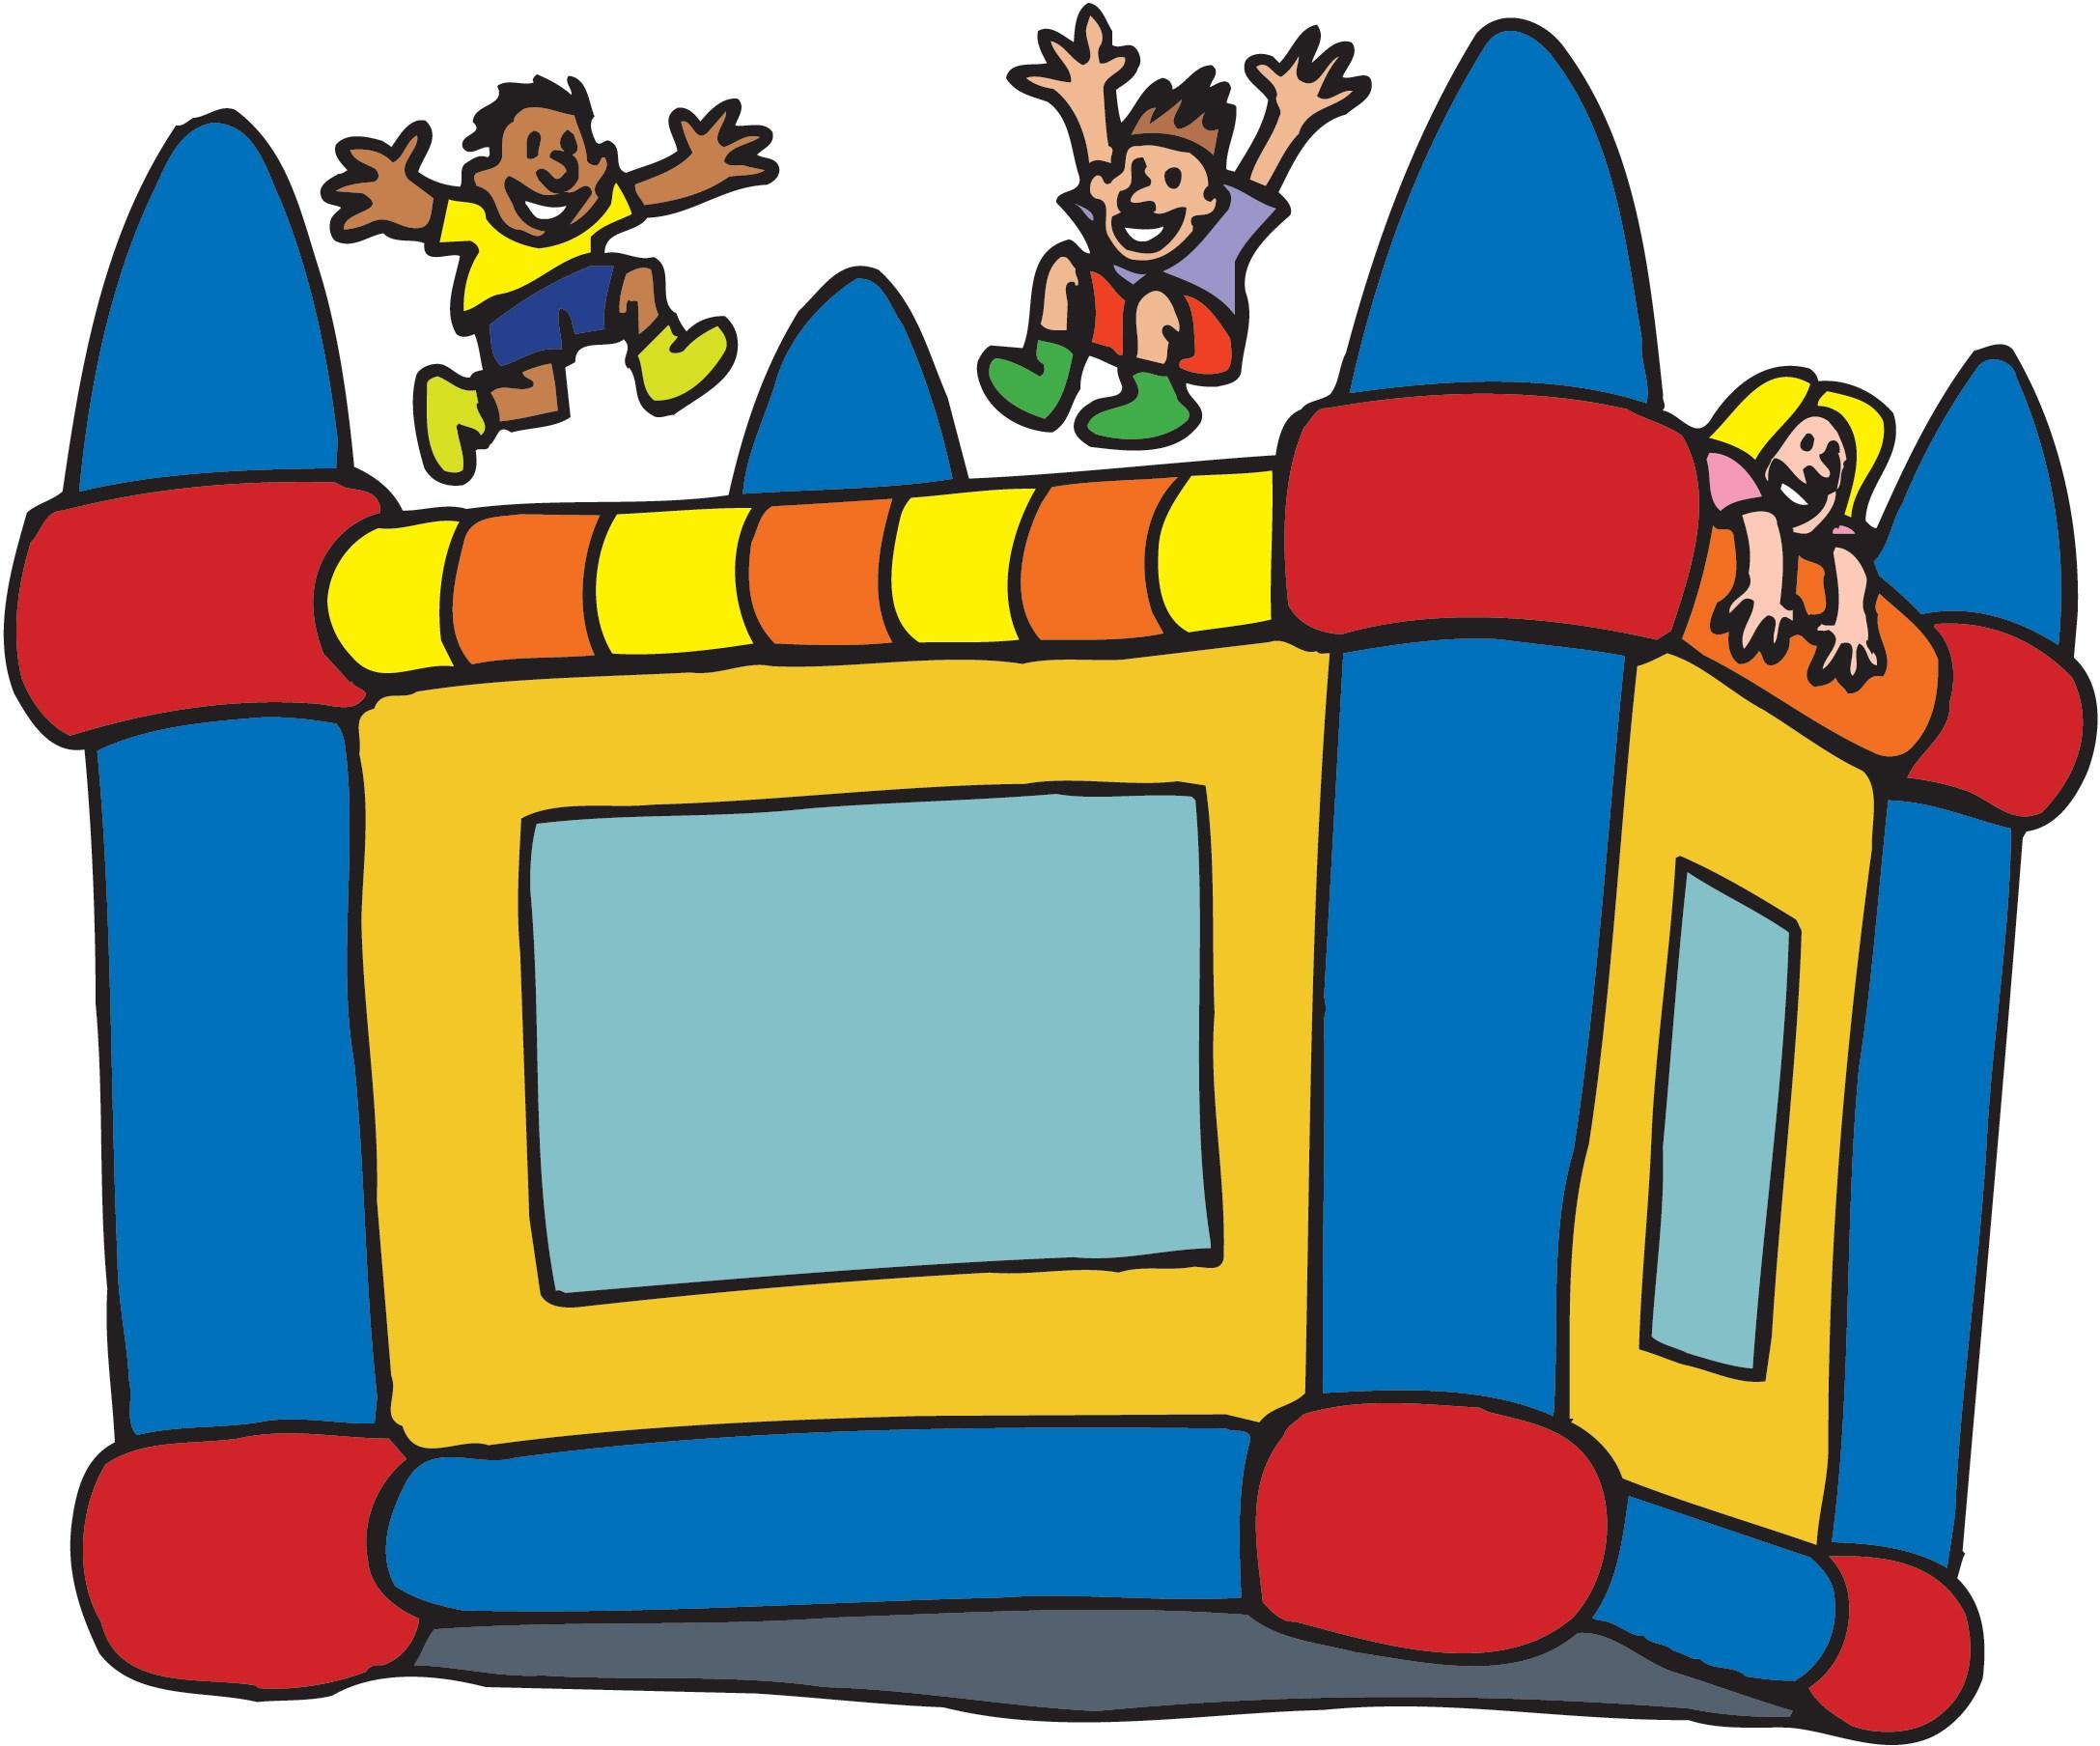 Bounce house clipart 3 » Clipart Portal.